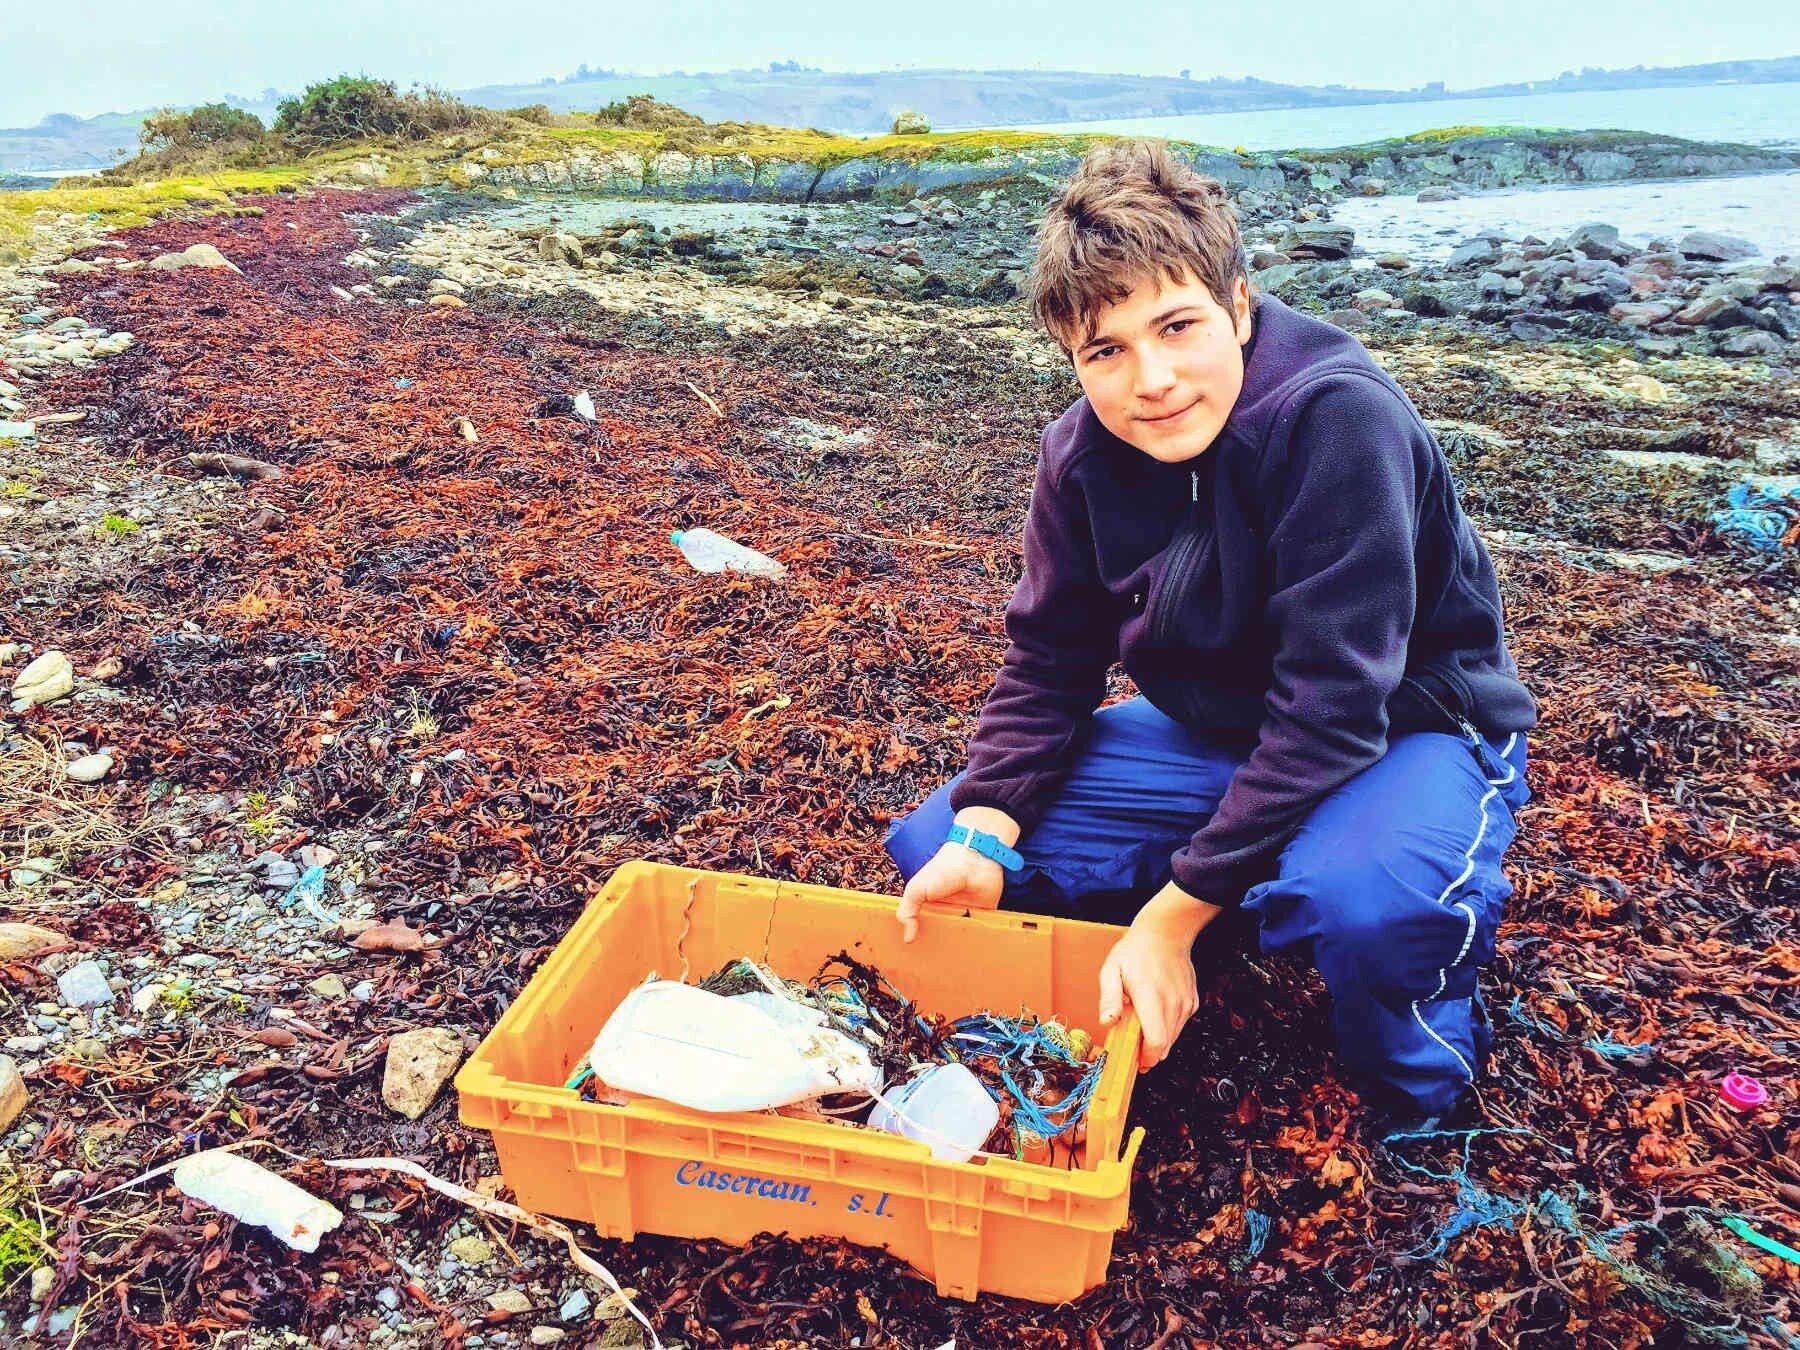 Fionn Ferreira collecting plastic waste